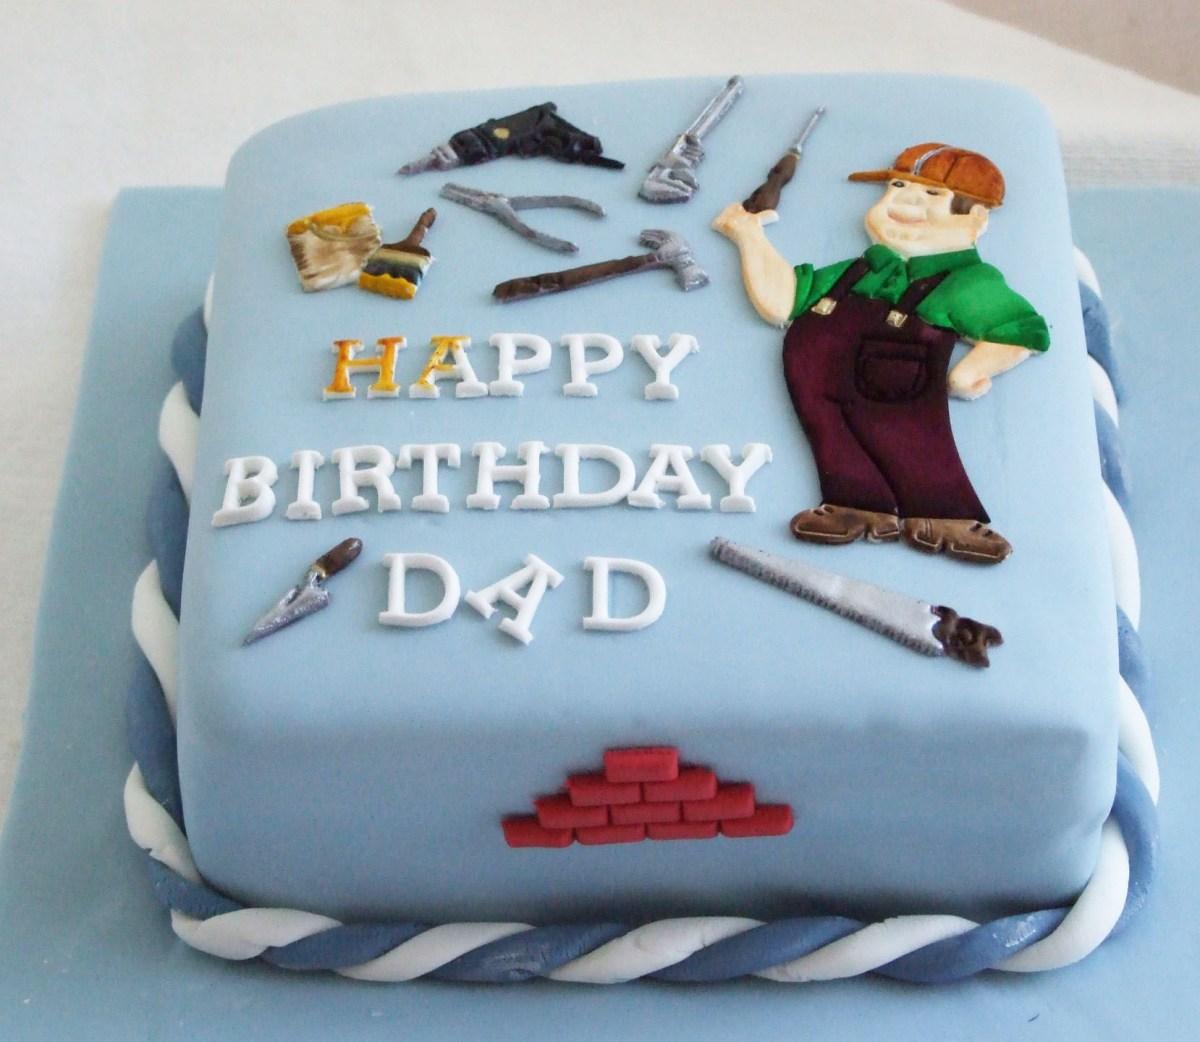 Enjoyable Birthday Cake For Dad Painter Dad Birthday Cake Father Cake Design Funny Birthday Cards Online Hendilapandamsfinfo